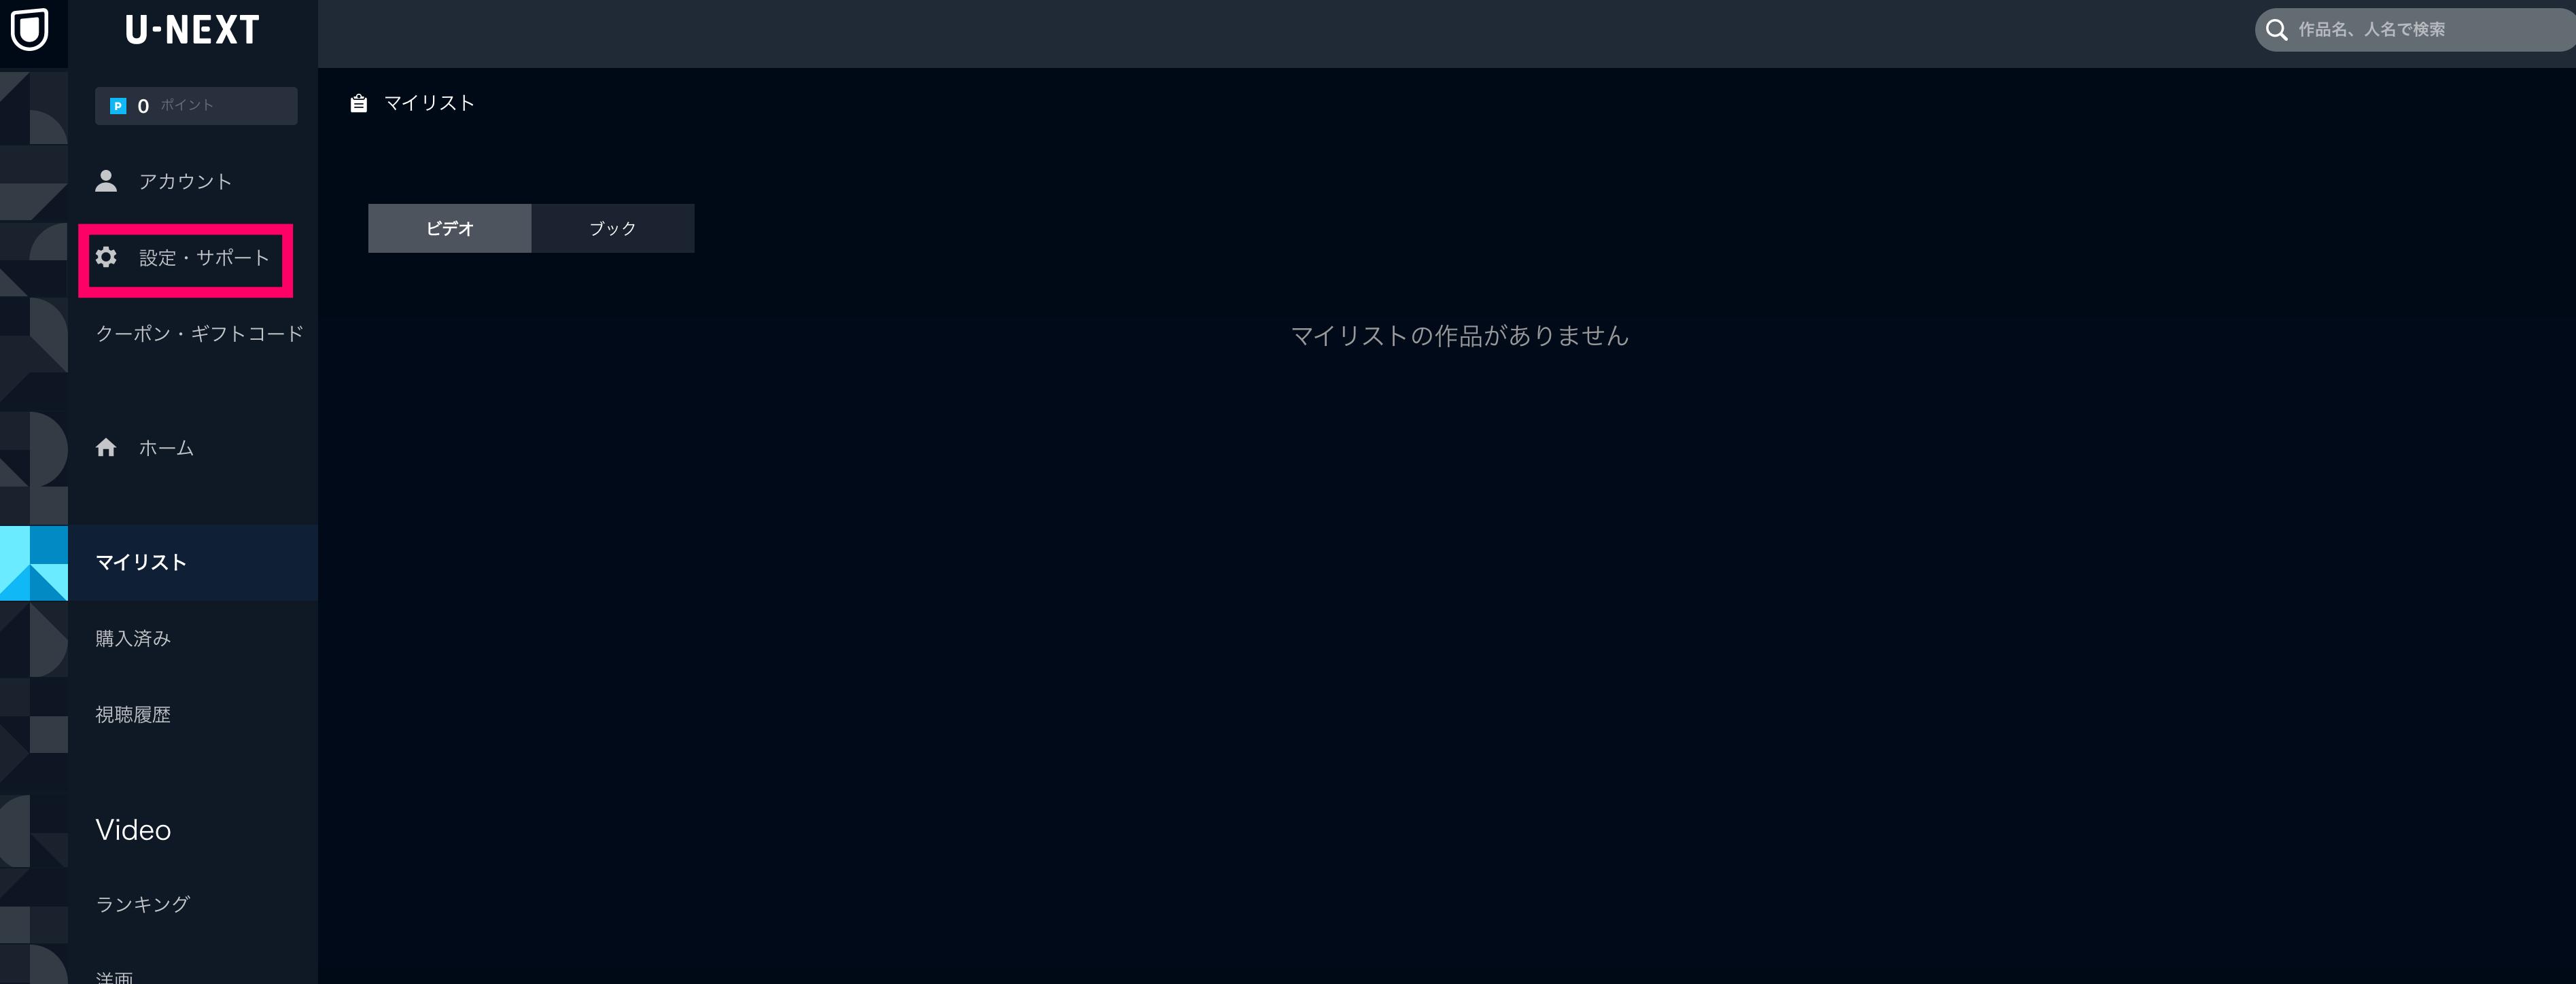 U-NEXT(ユーネクスト)の設定